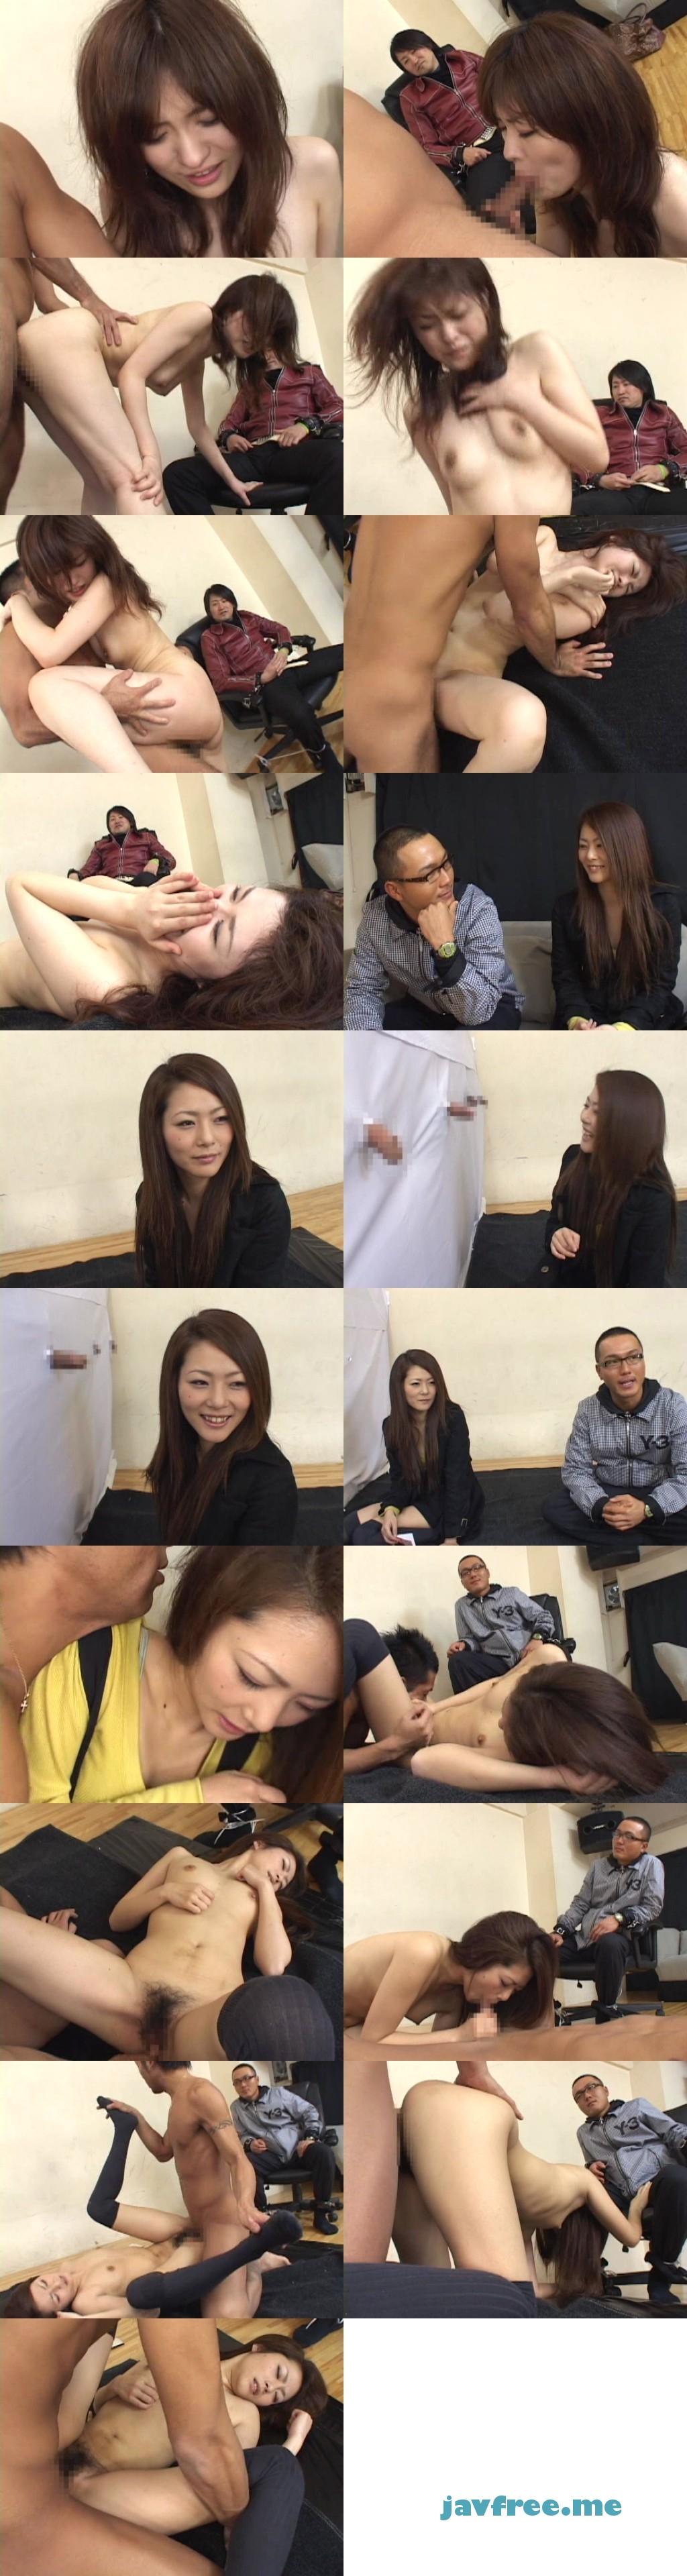 [HJMO-086] 街角シリーズ 彼女なら!彼氏のち○ぽ当ててみろ!! 6 - image hjmo086b on https://javfree.me